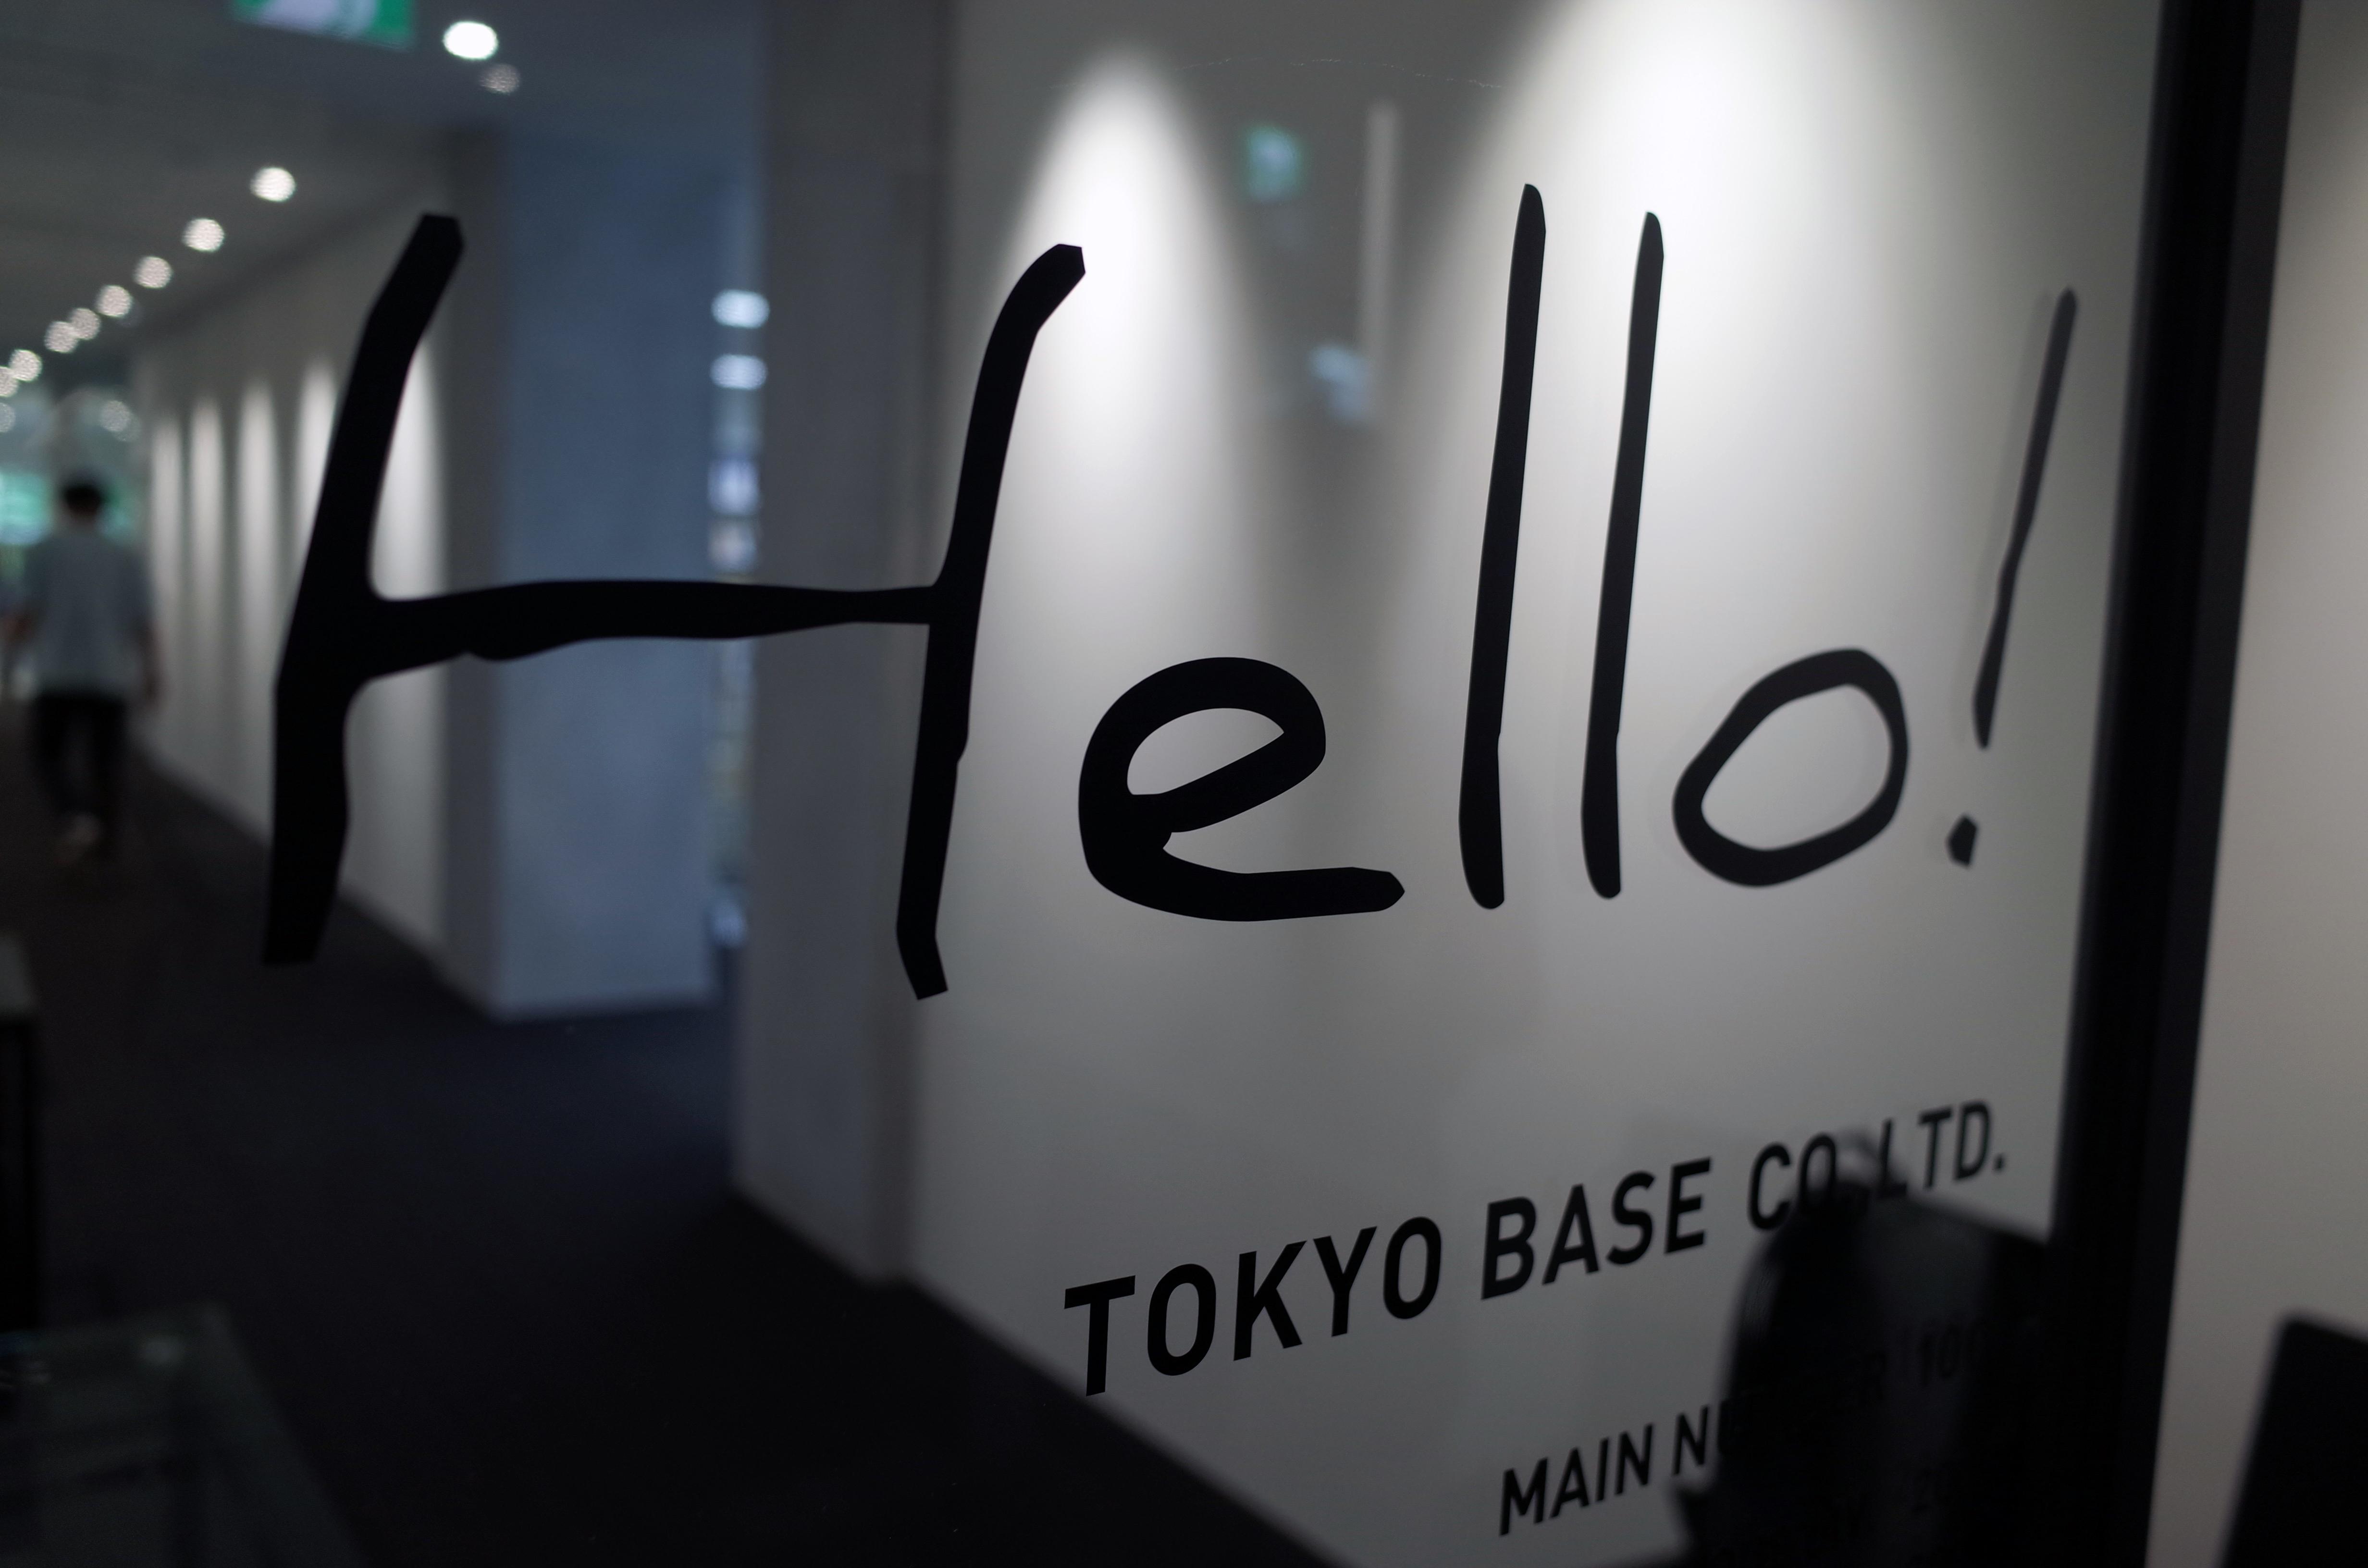 「STUDIOUS」運営のTOKYO BASE、アプリリニューアルで表現した世界観